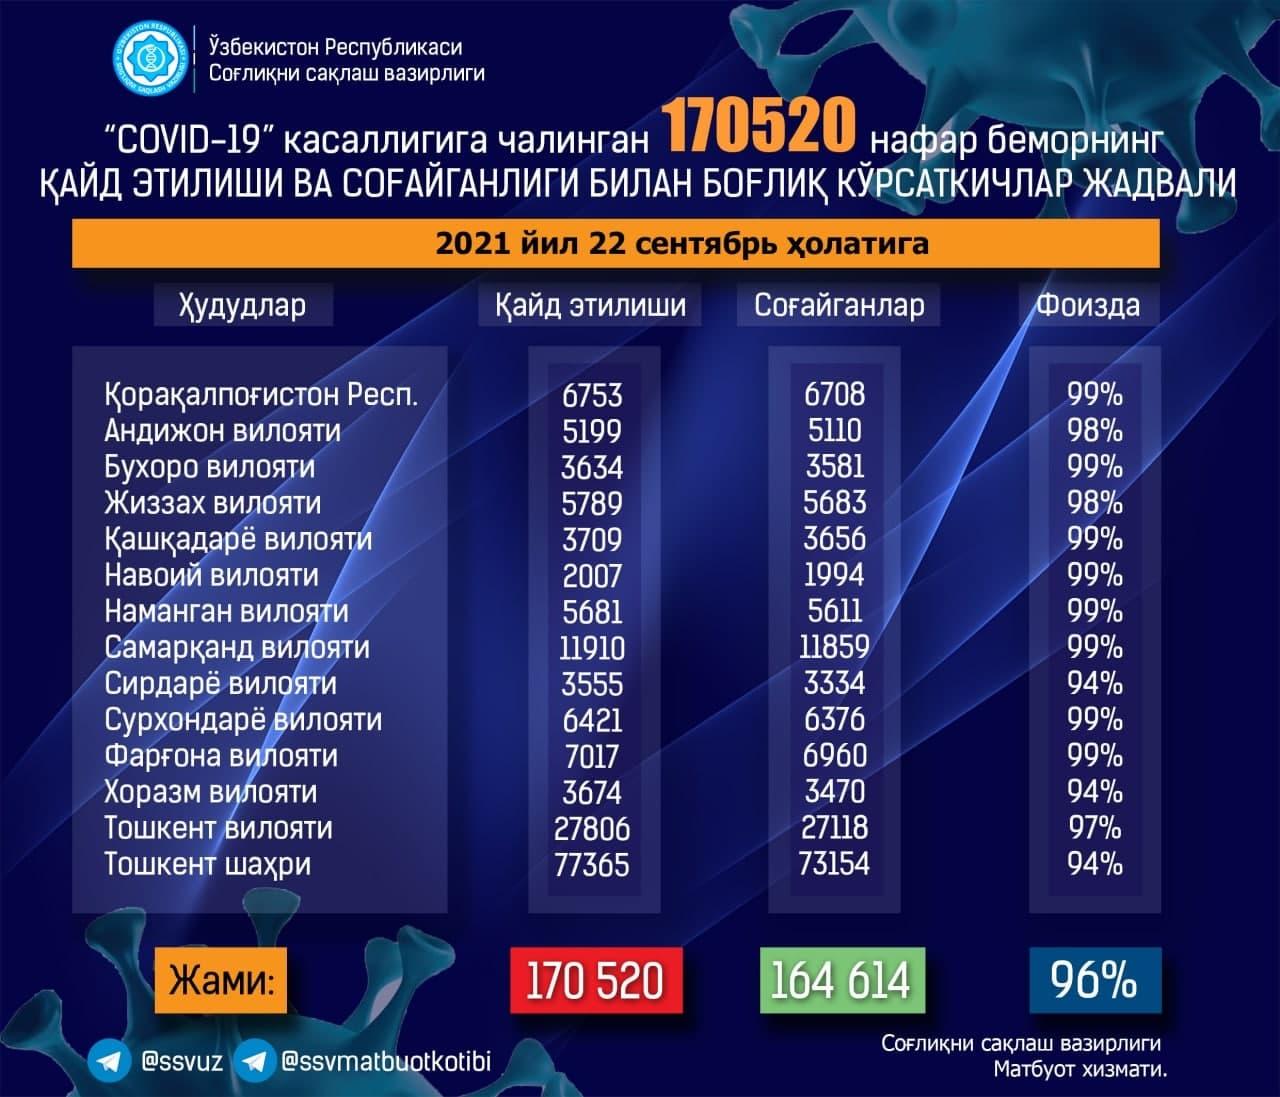 В Ташкенте растет количество зараженных коронавирусом за сутки — статистика